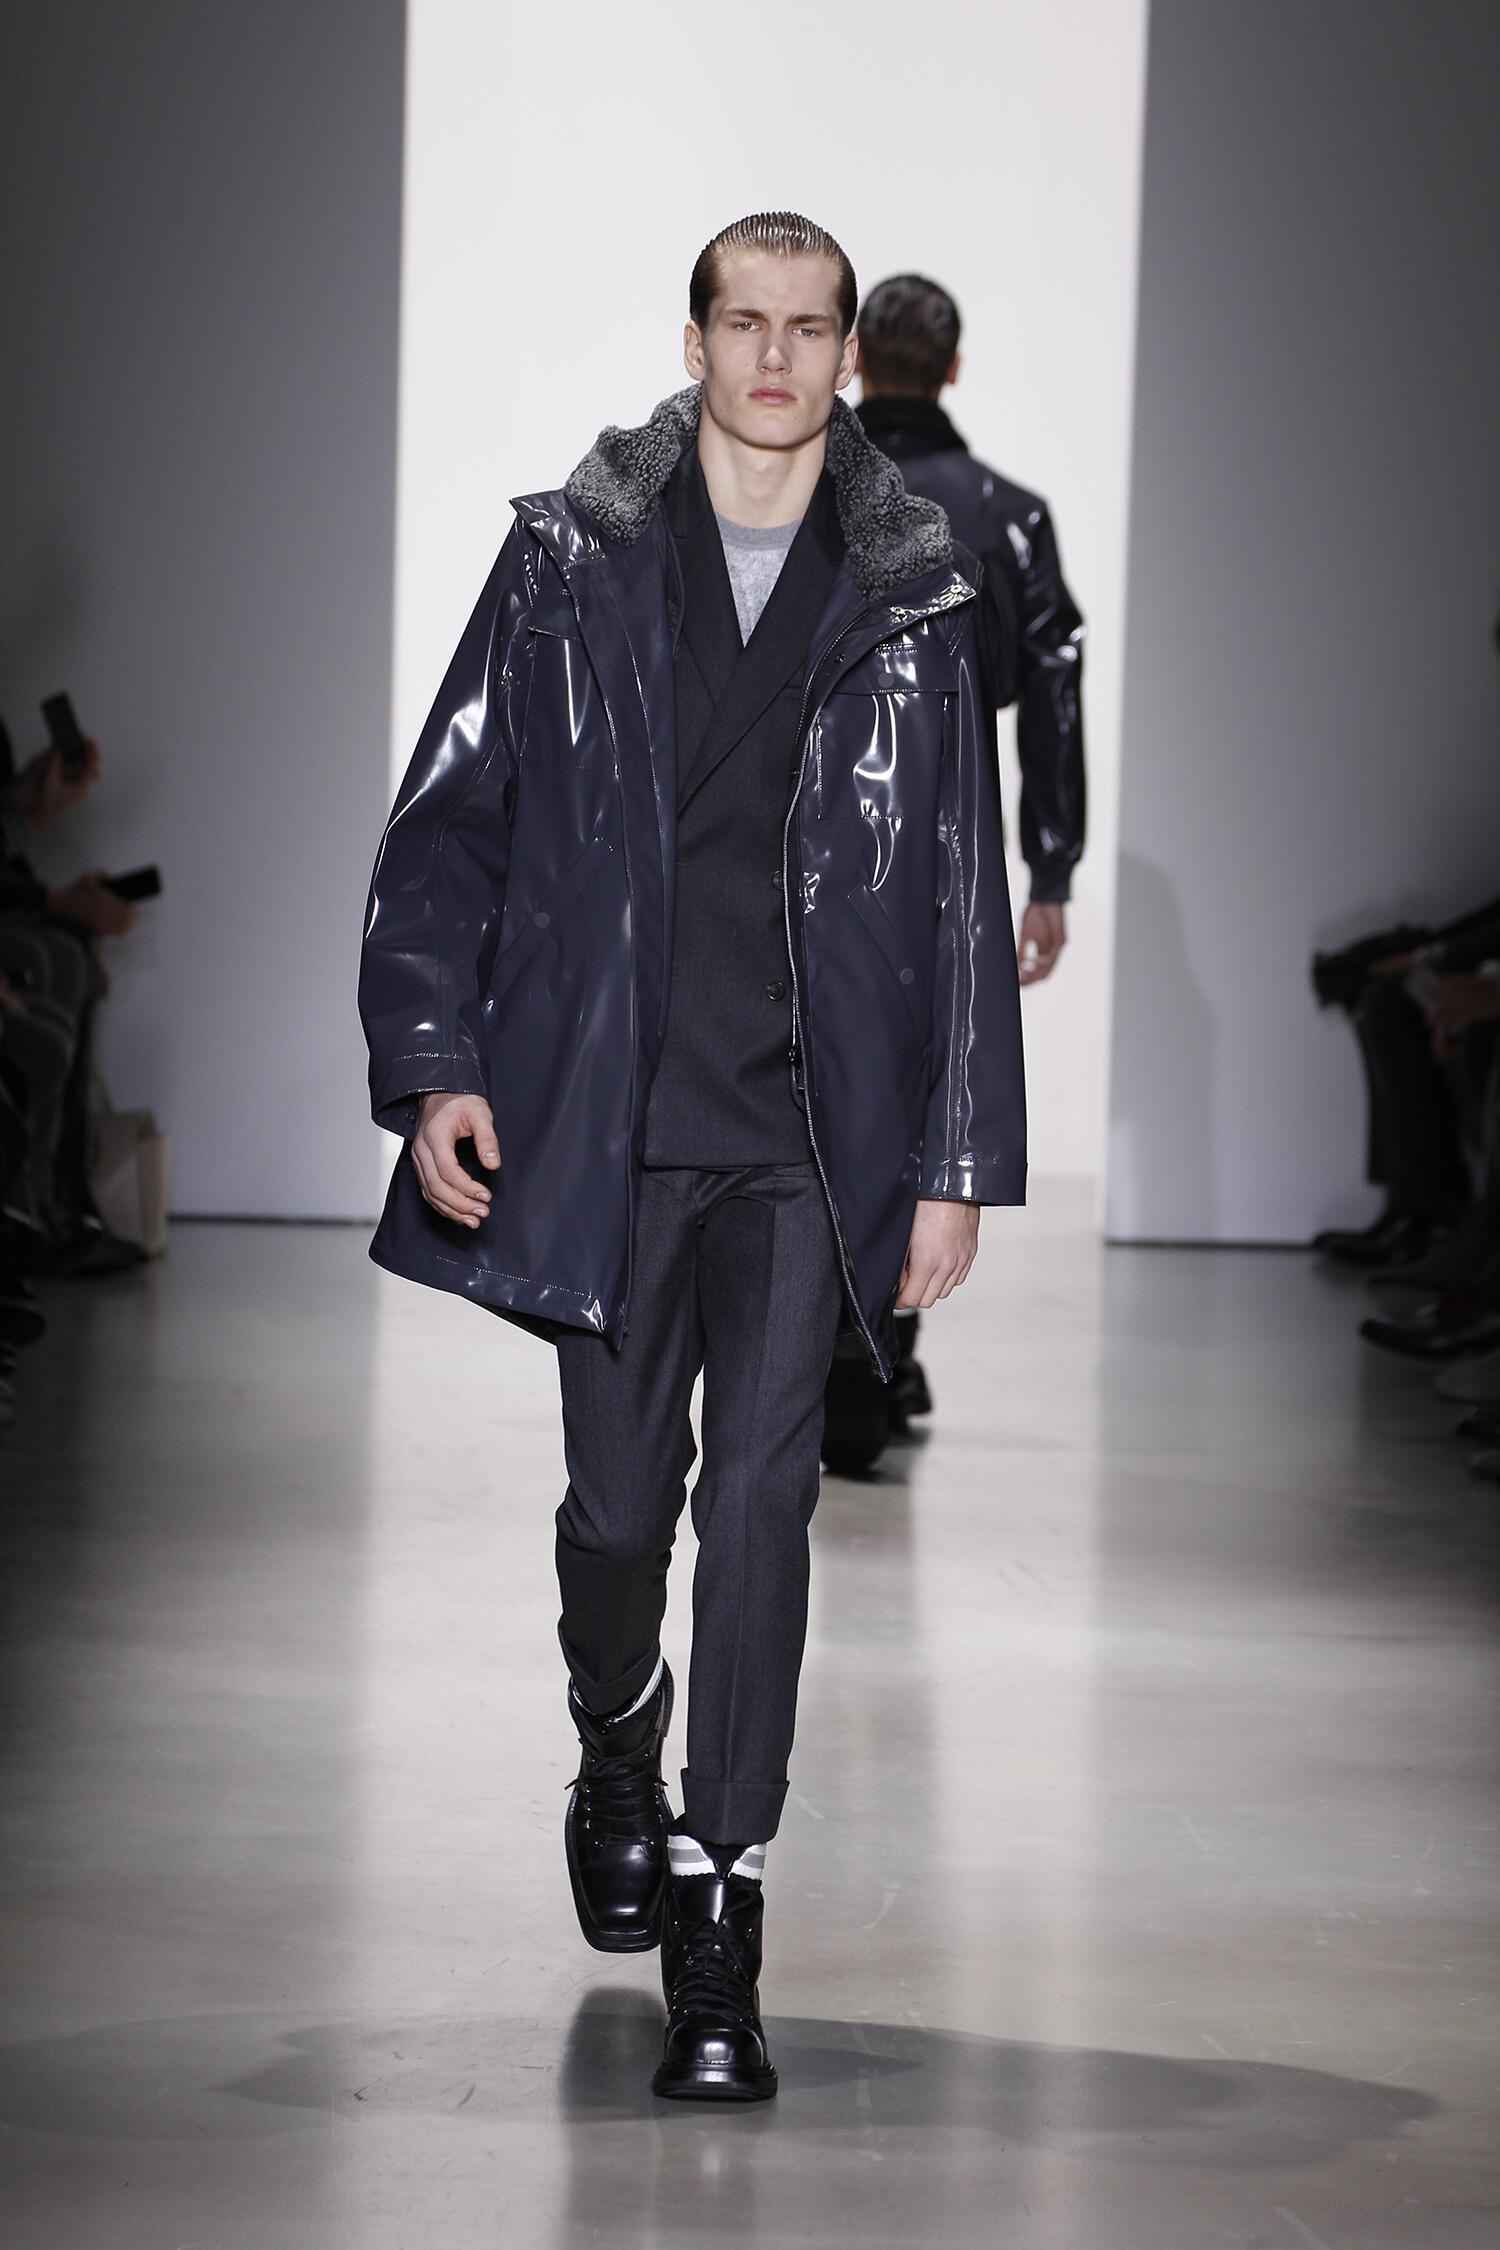 Catwalk Calvin Klein Fall Winter 2015 16 Men's Collection Milano Fashion Week